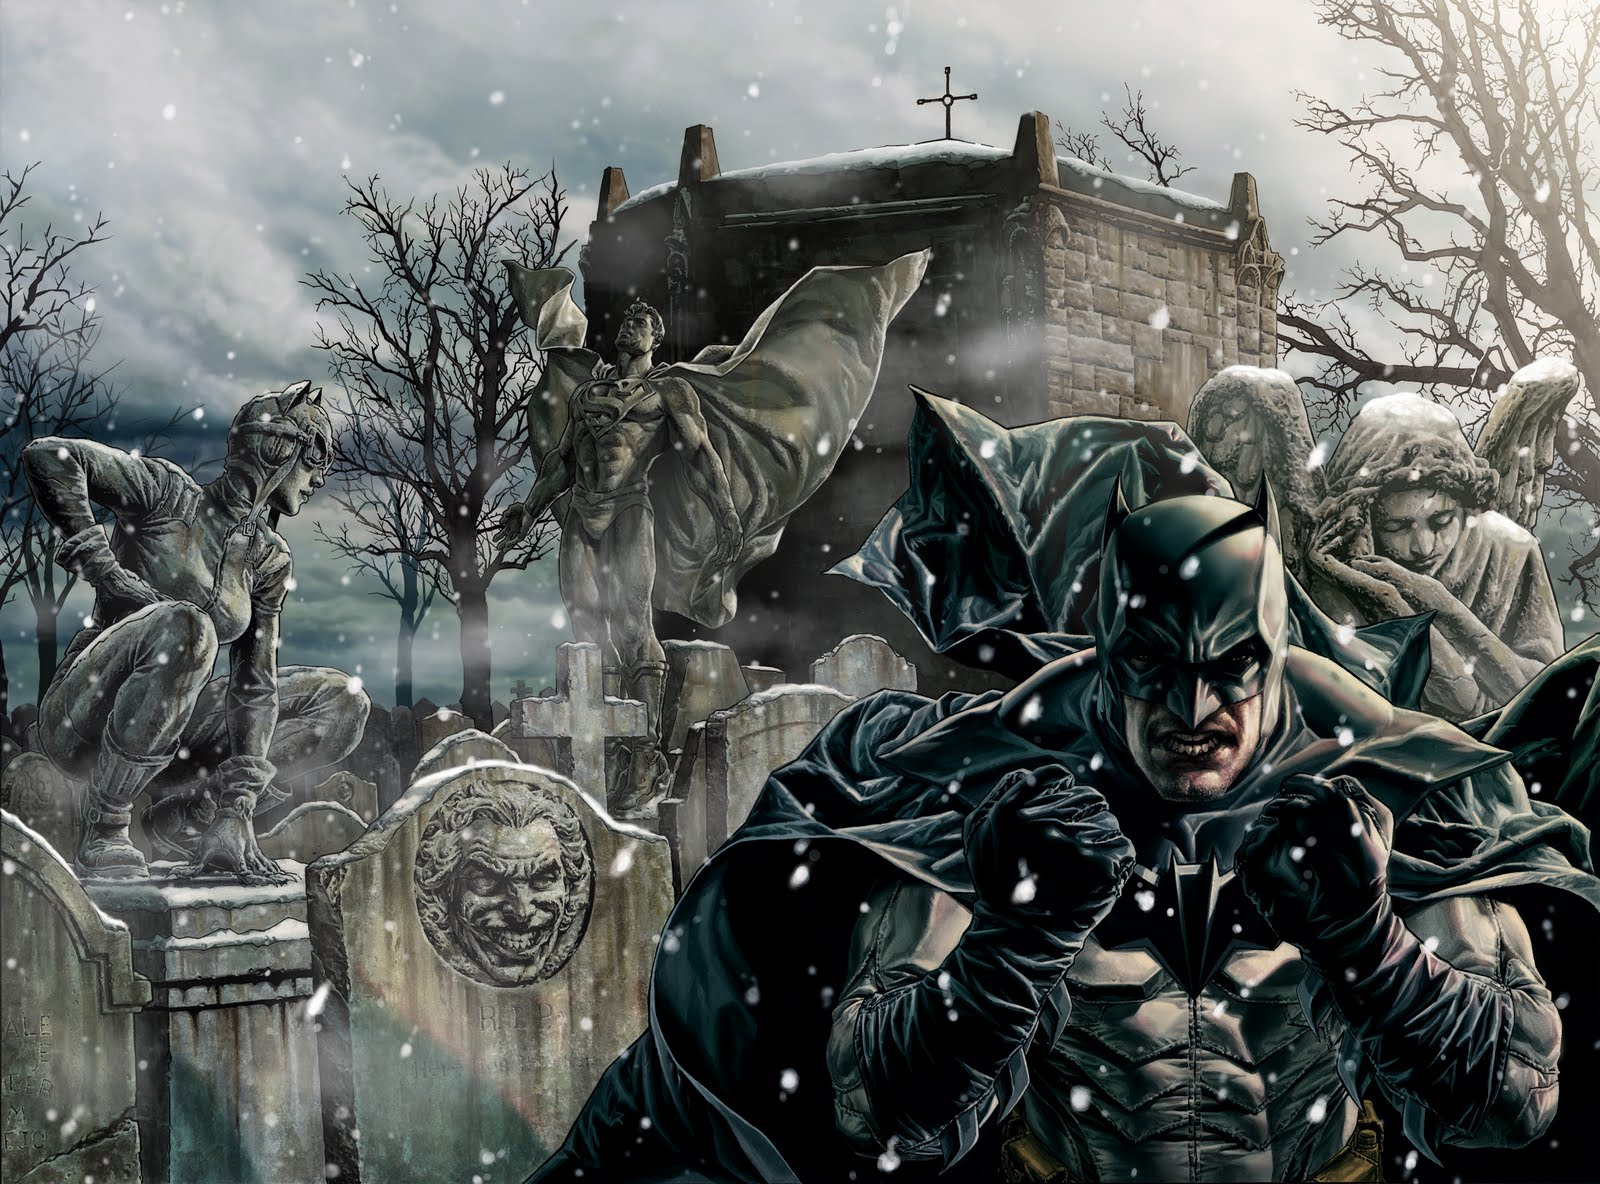 Thématique de Noël : Batman Noël de Lee Bermejo dans 3D batmannoel